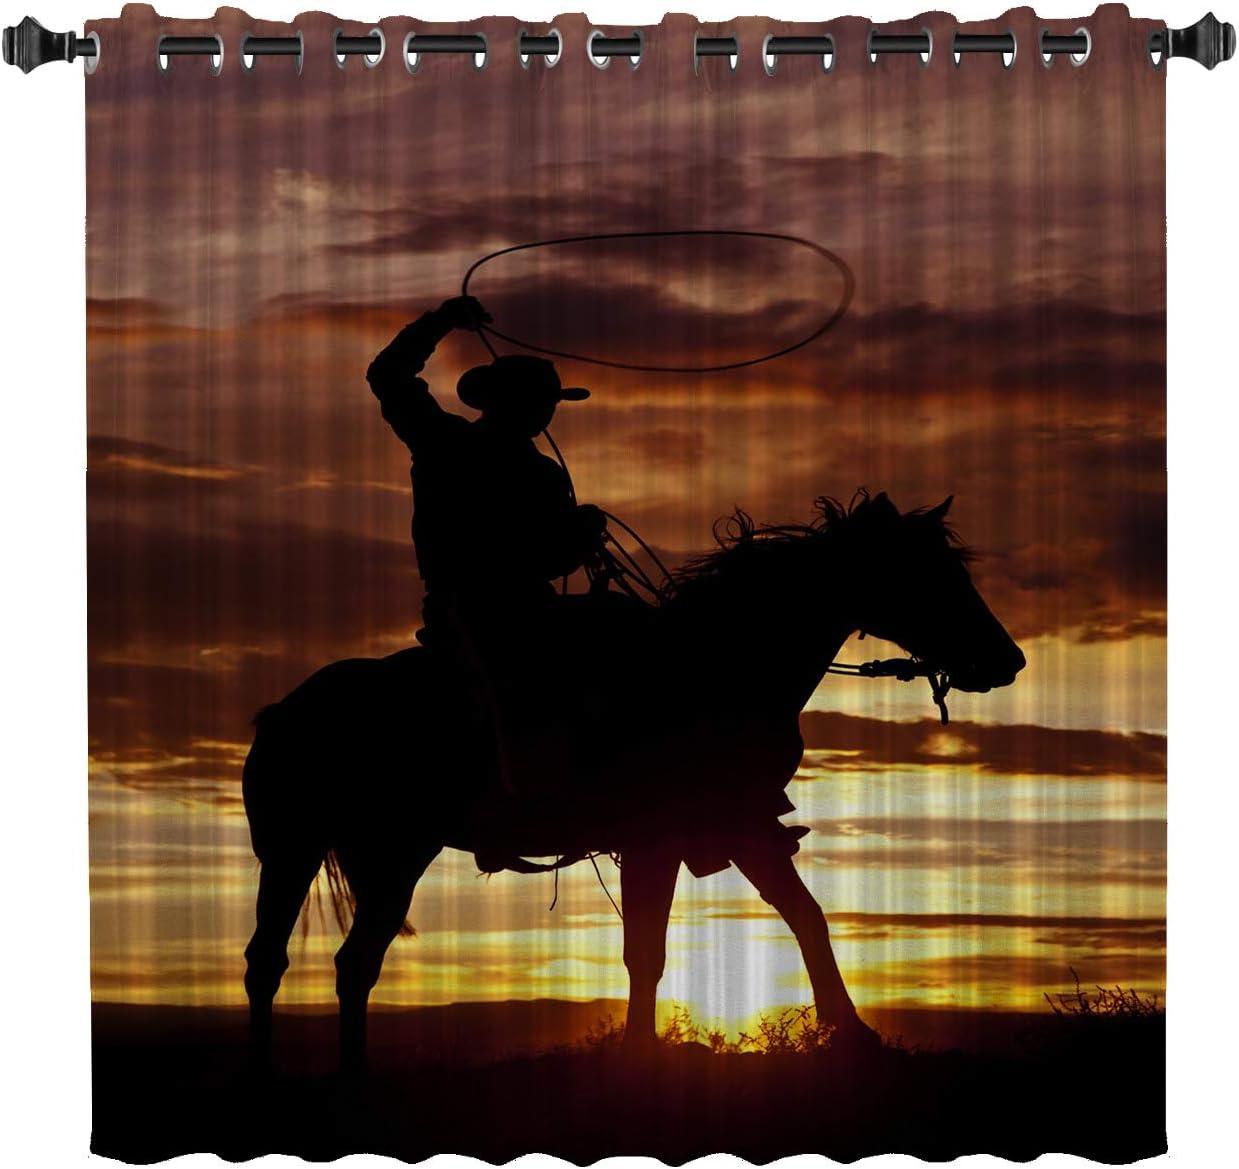 List price Chaven Home Darkening Window Curtain West B Fort Worth Mall Sunset Panel Cowboy